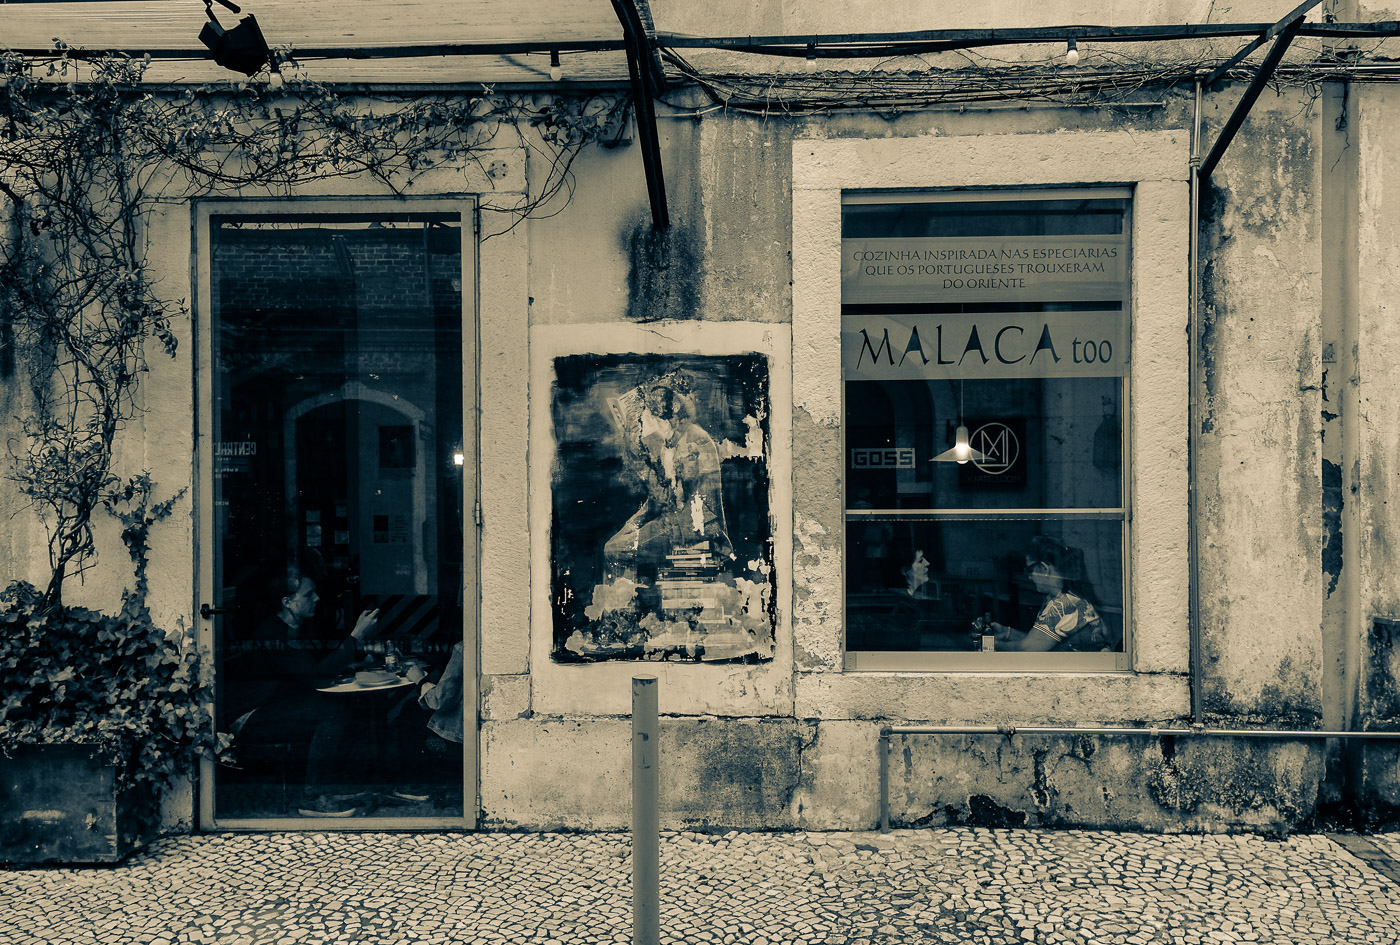 hb images - Lisboa - last day - 8